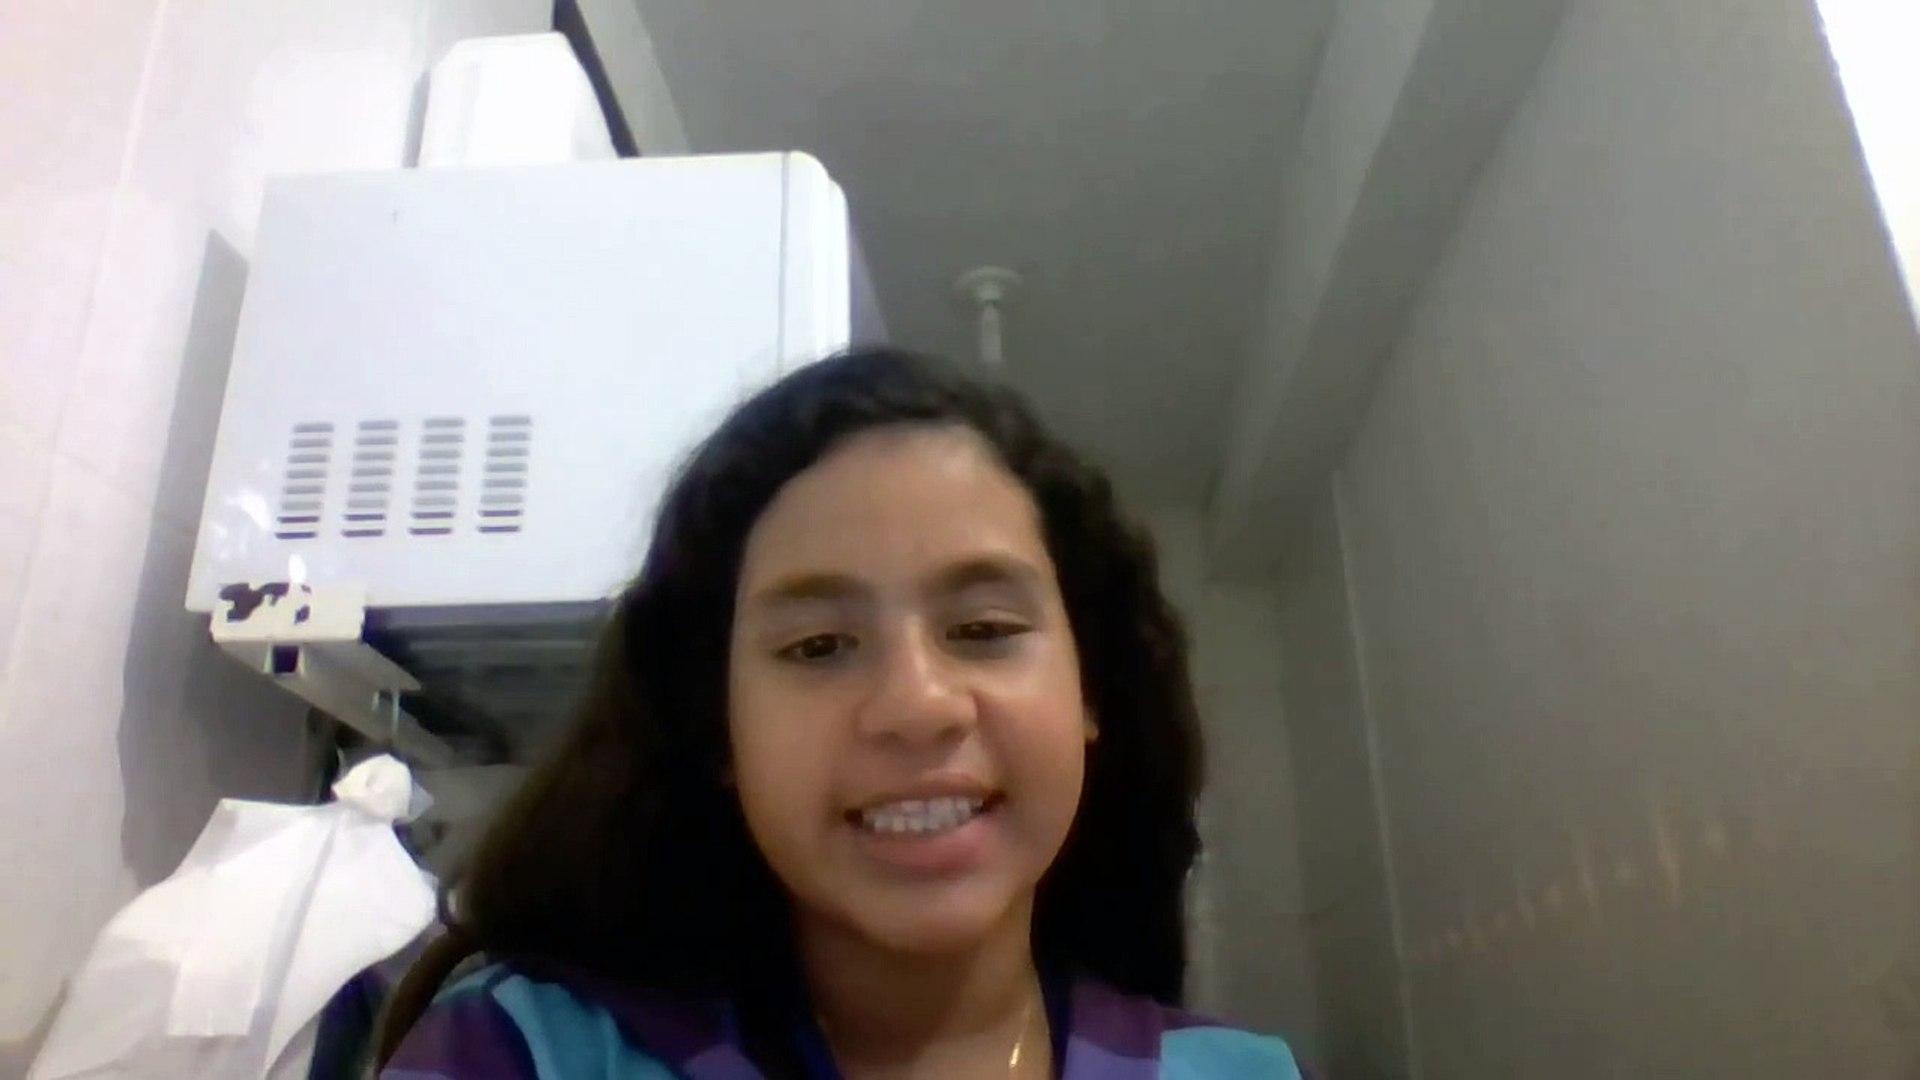 DESAFIO QUE ME PEDIRÃO PARA CANTAR A MUSICA QUERO VOCE DA BANDA FLY